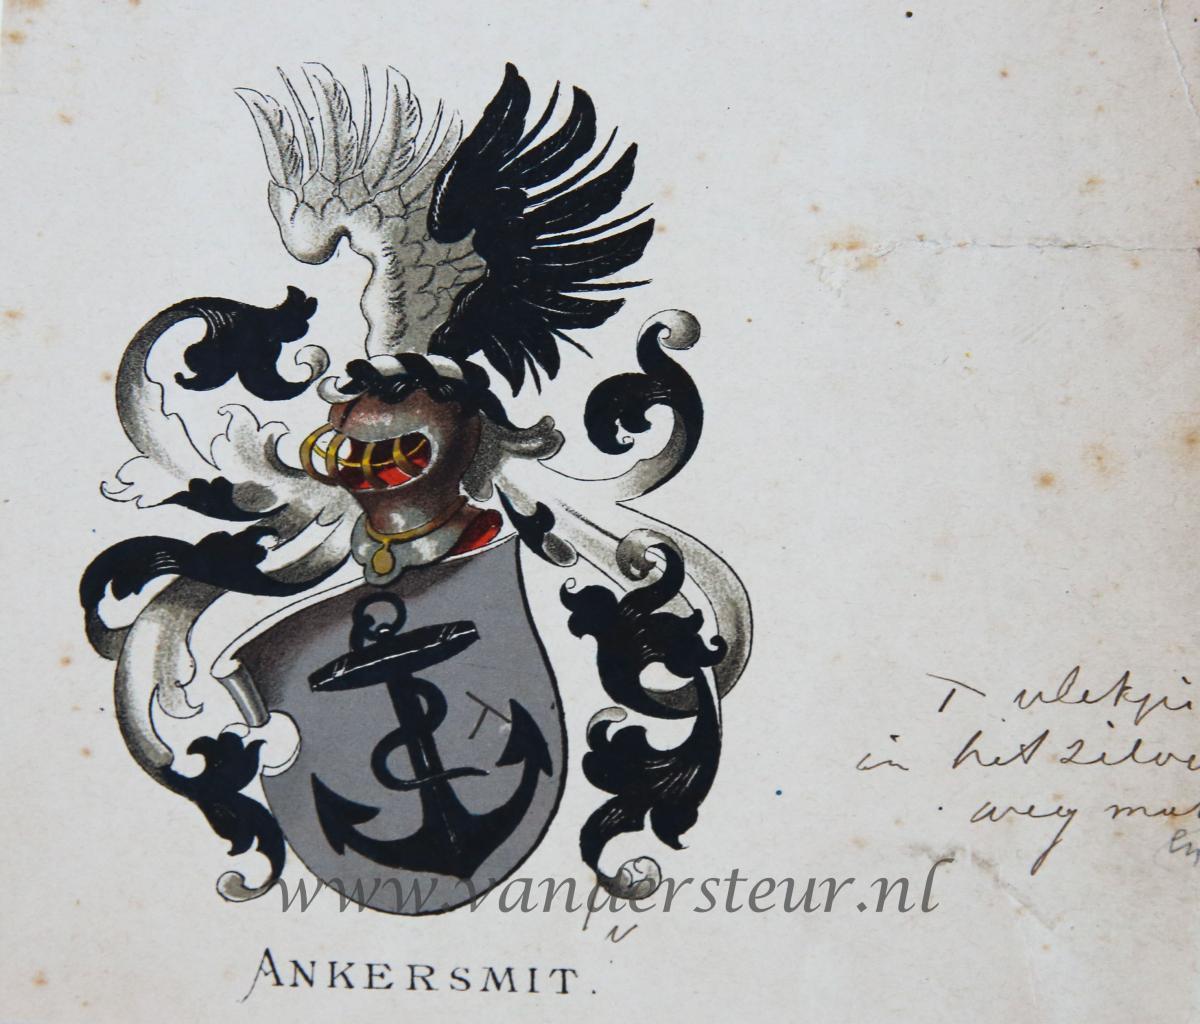 Wapenkaart/Coat of Arms: Ankersmit